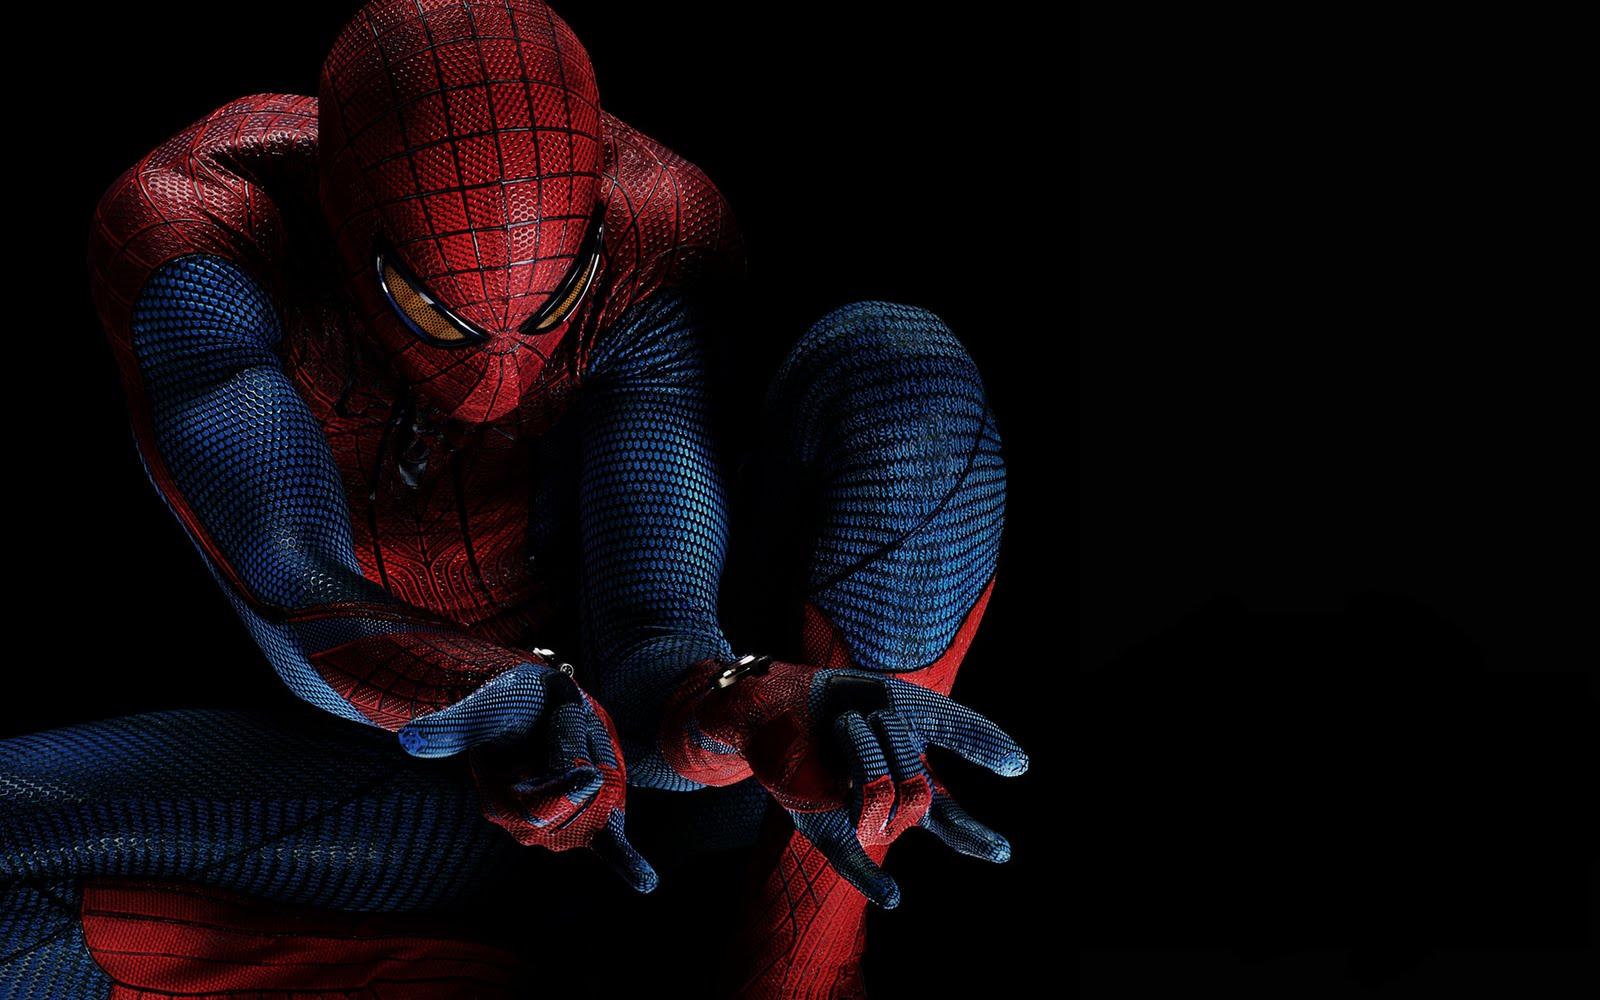 http://2.bp.blogspot.com/-OW-_osLxxZE/Tif2ahpvFAI/AAAAAAAAAQ0/3F7o7DYLVv8/s1600/The-Amazing-Spider-Man-2012-Wallpaper-HD-spiderman-spiderman-spider-man.jpg